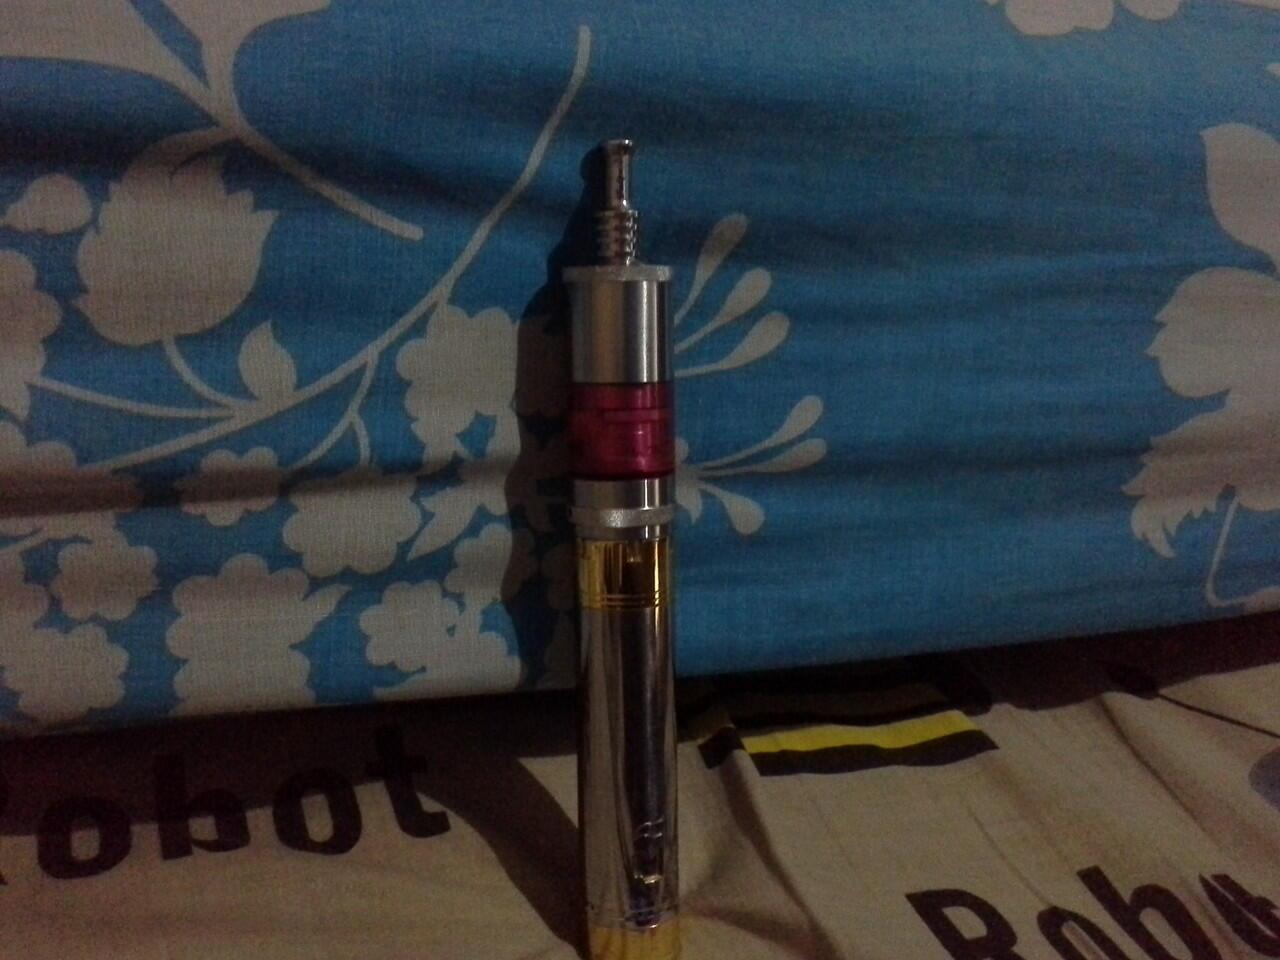 vapo mecha kit castle mod taifun gt batre efest samsung charger nitecore cotton wire